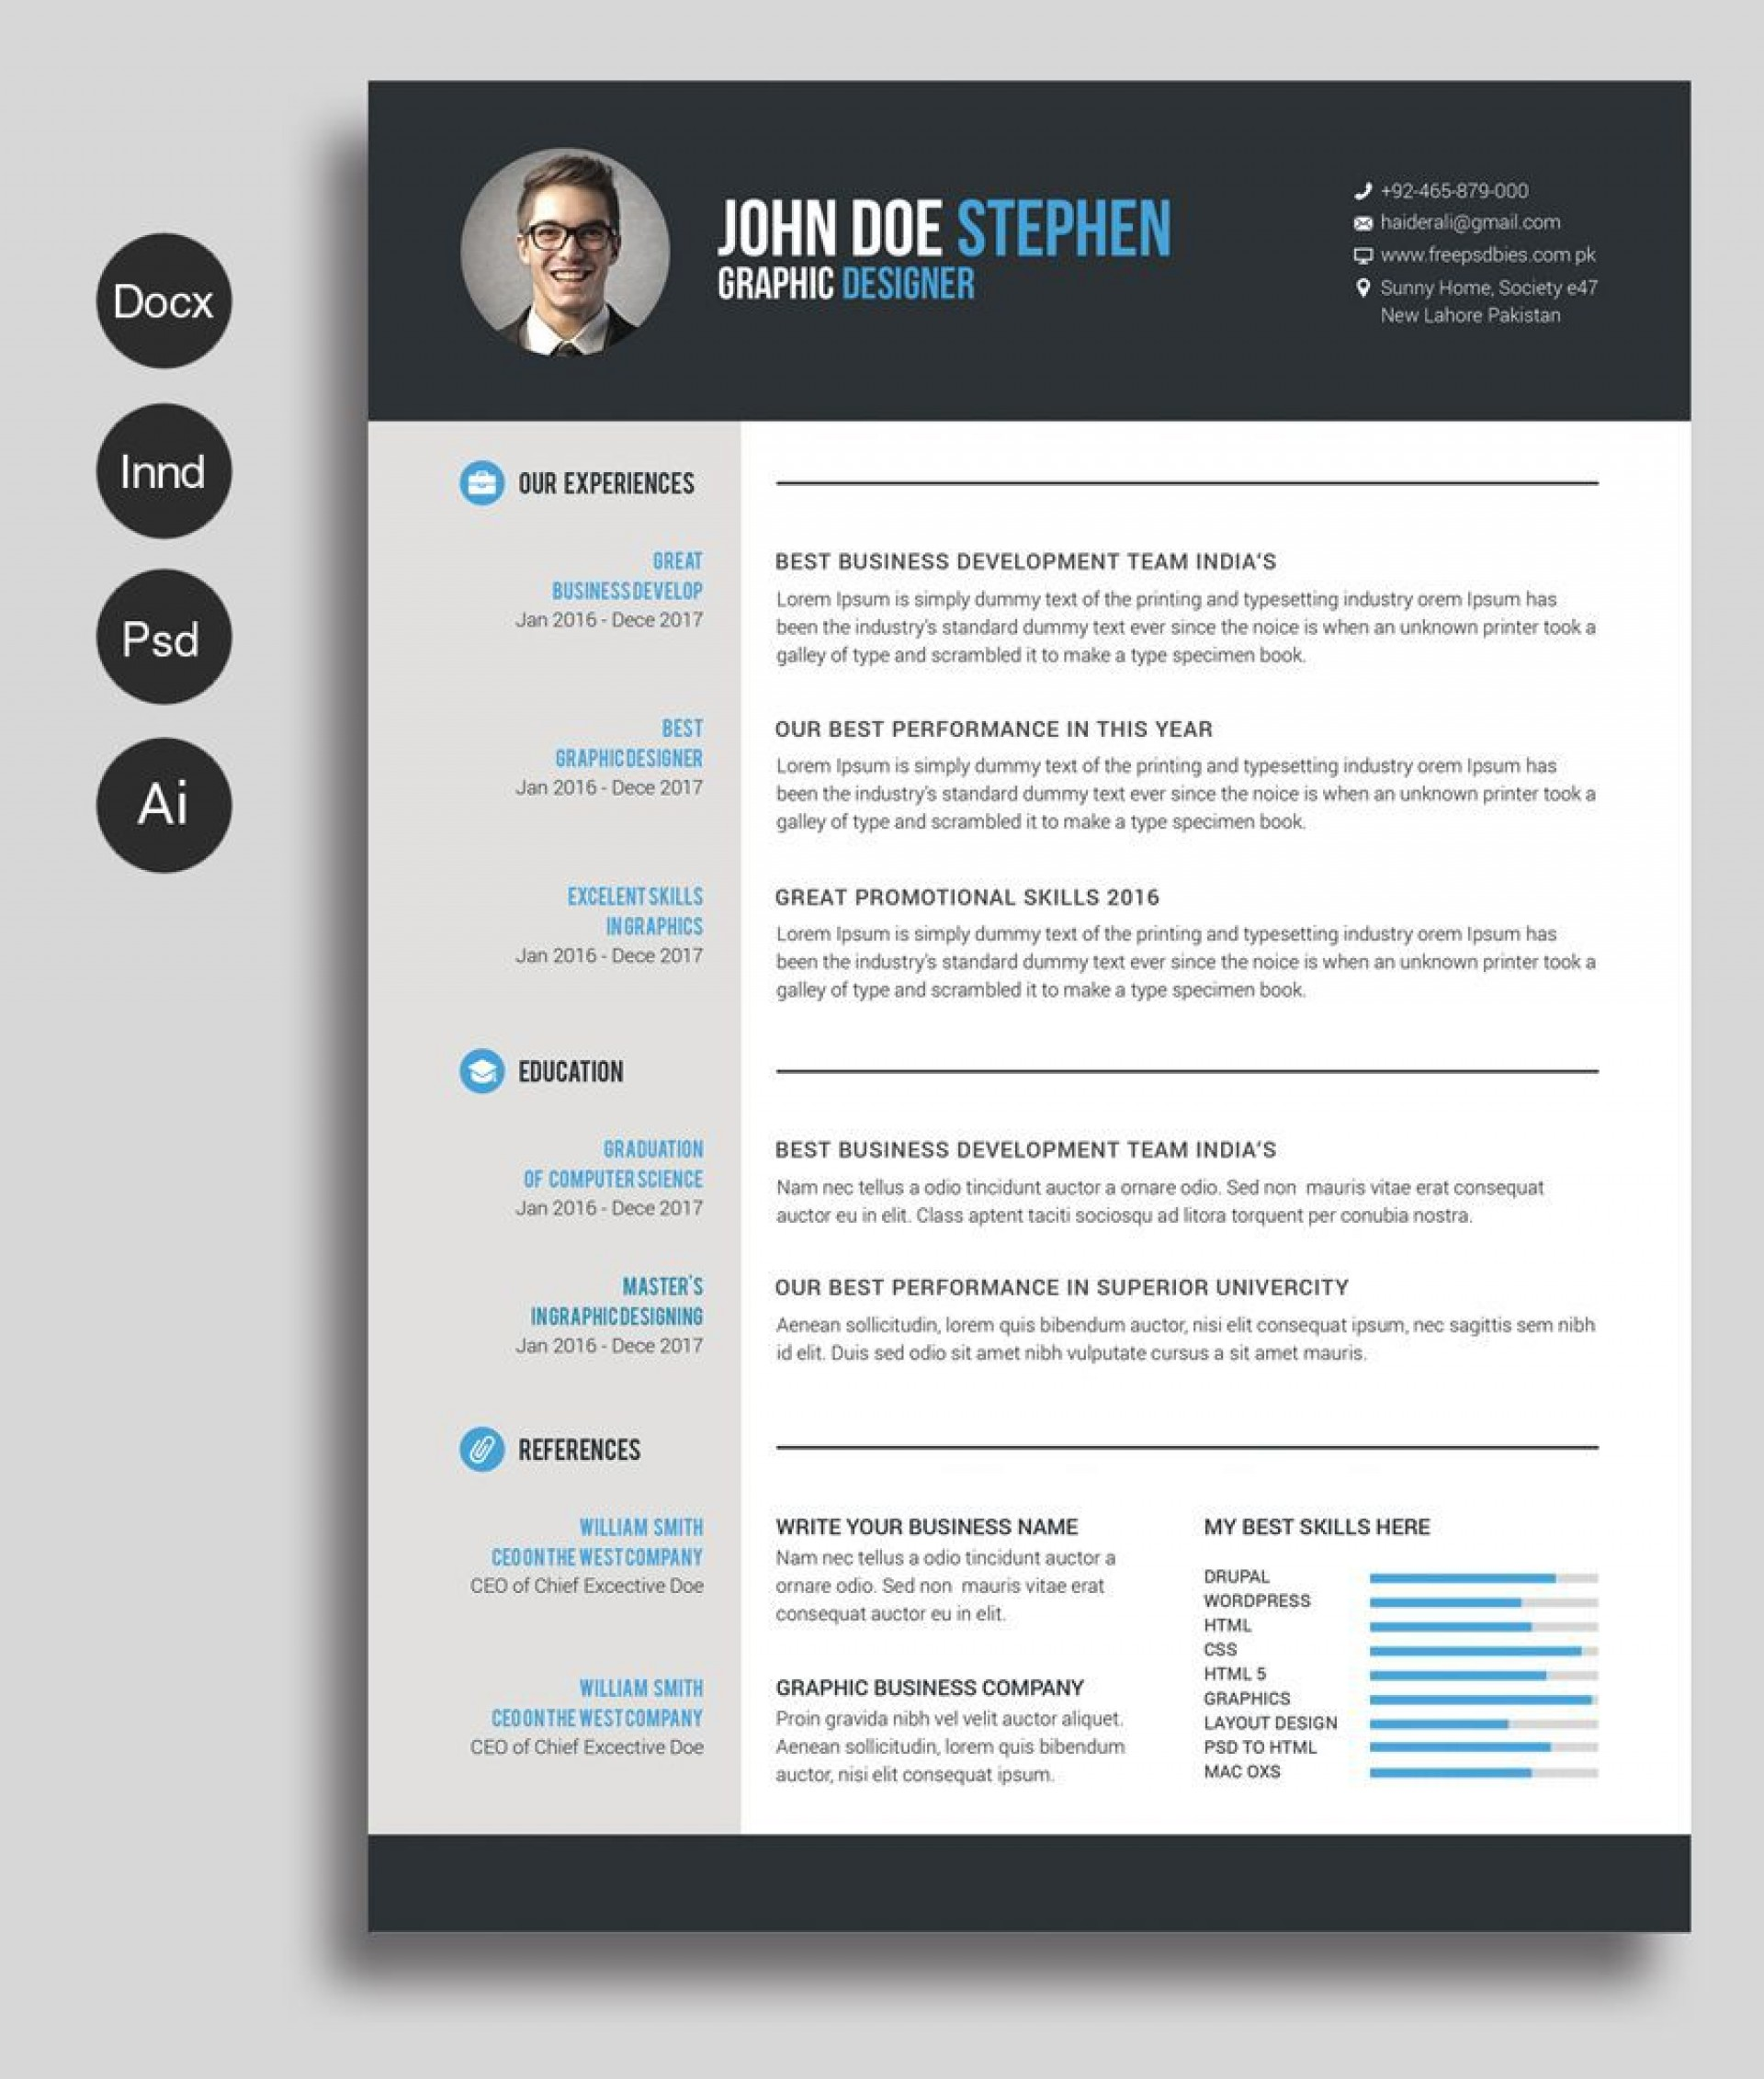 001 Outstanding Cv Resume Word Template Free Download Design  Curriculum Vitae1920